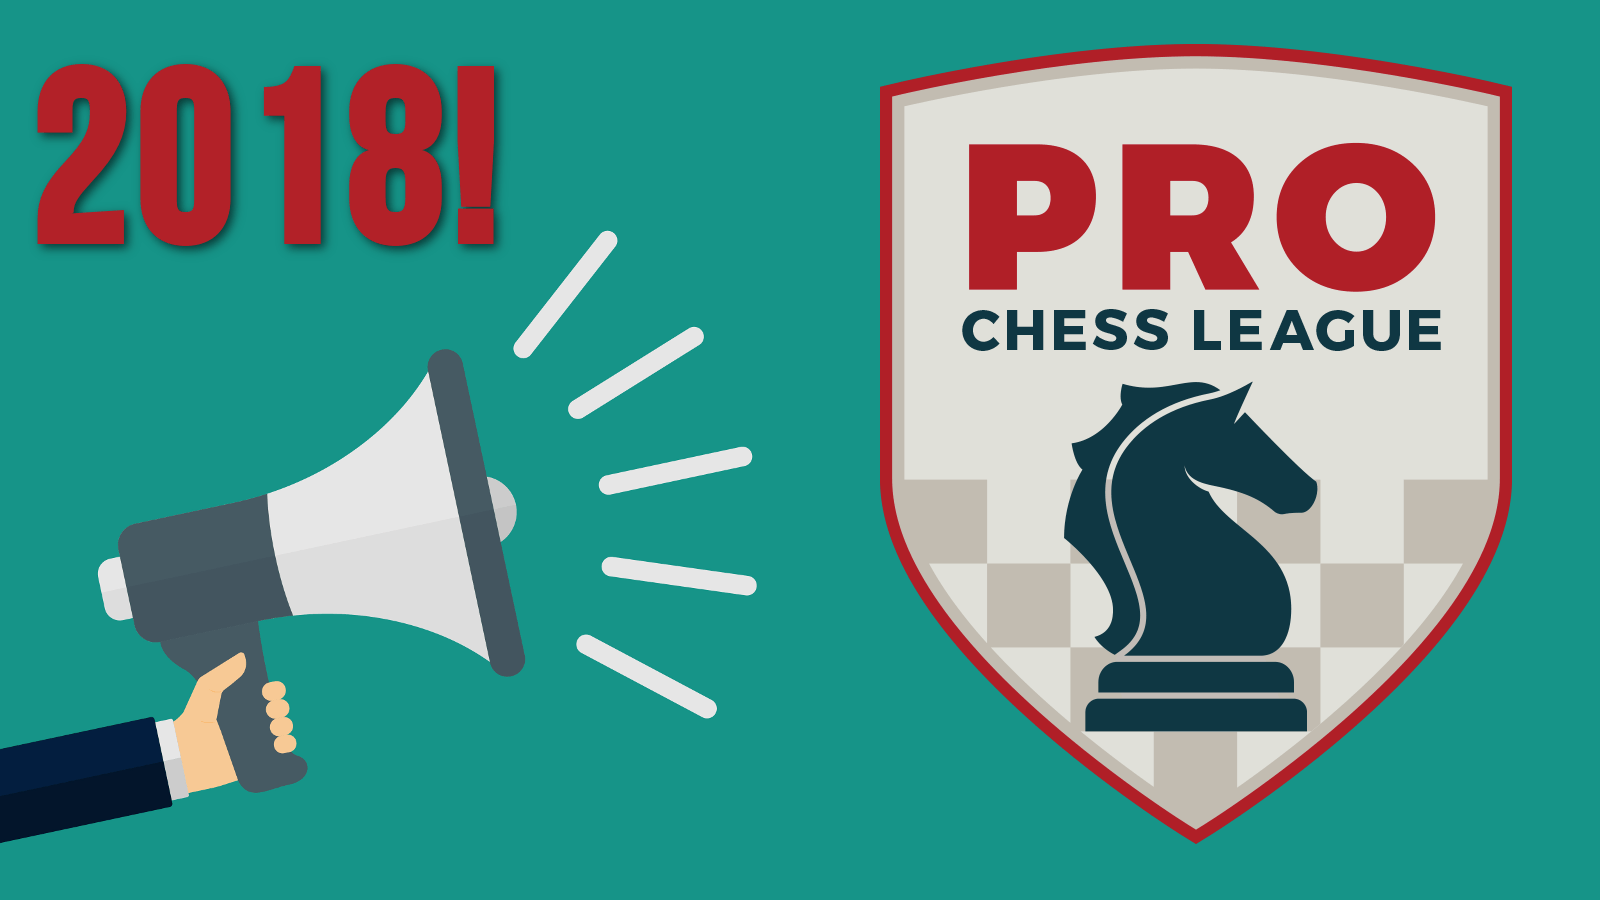 Pro Chess League Announces Returning Teams New Qualifiers